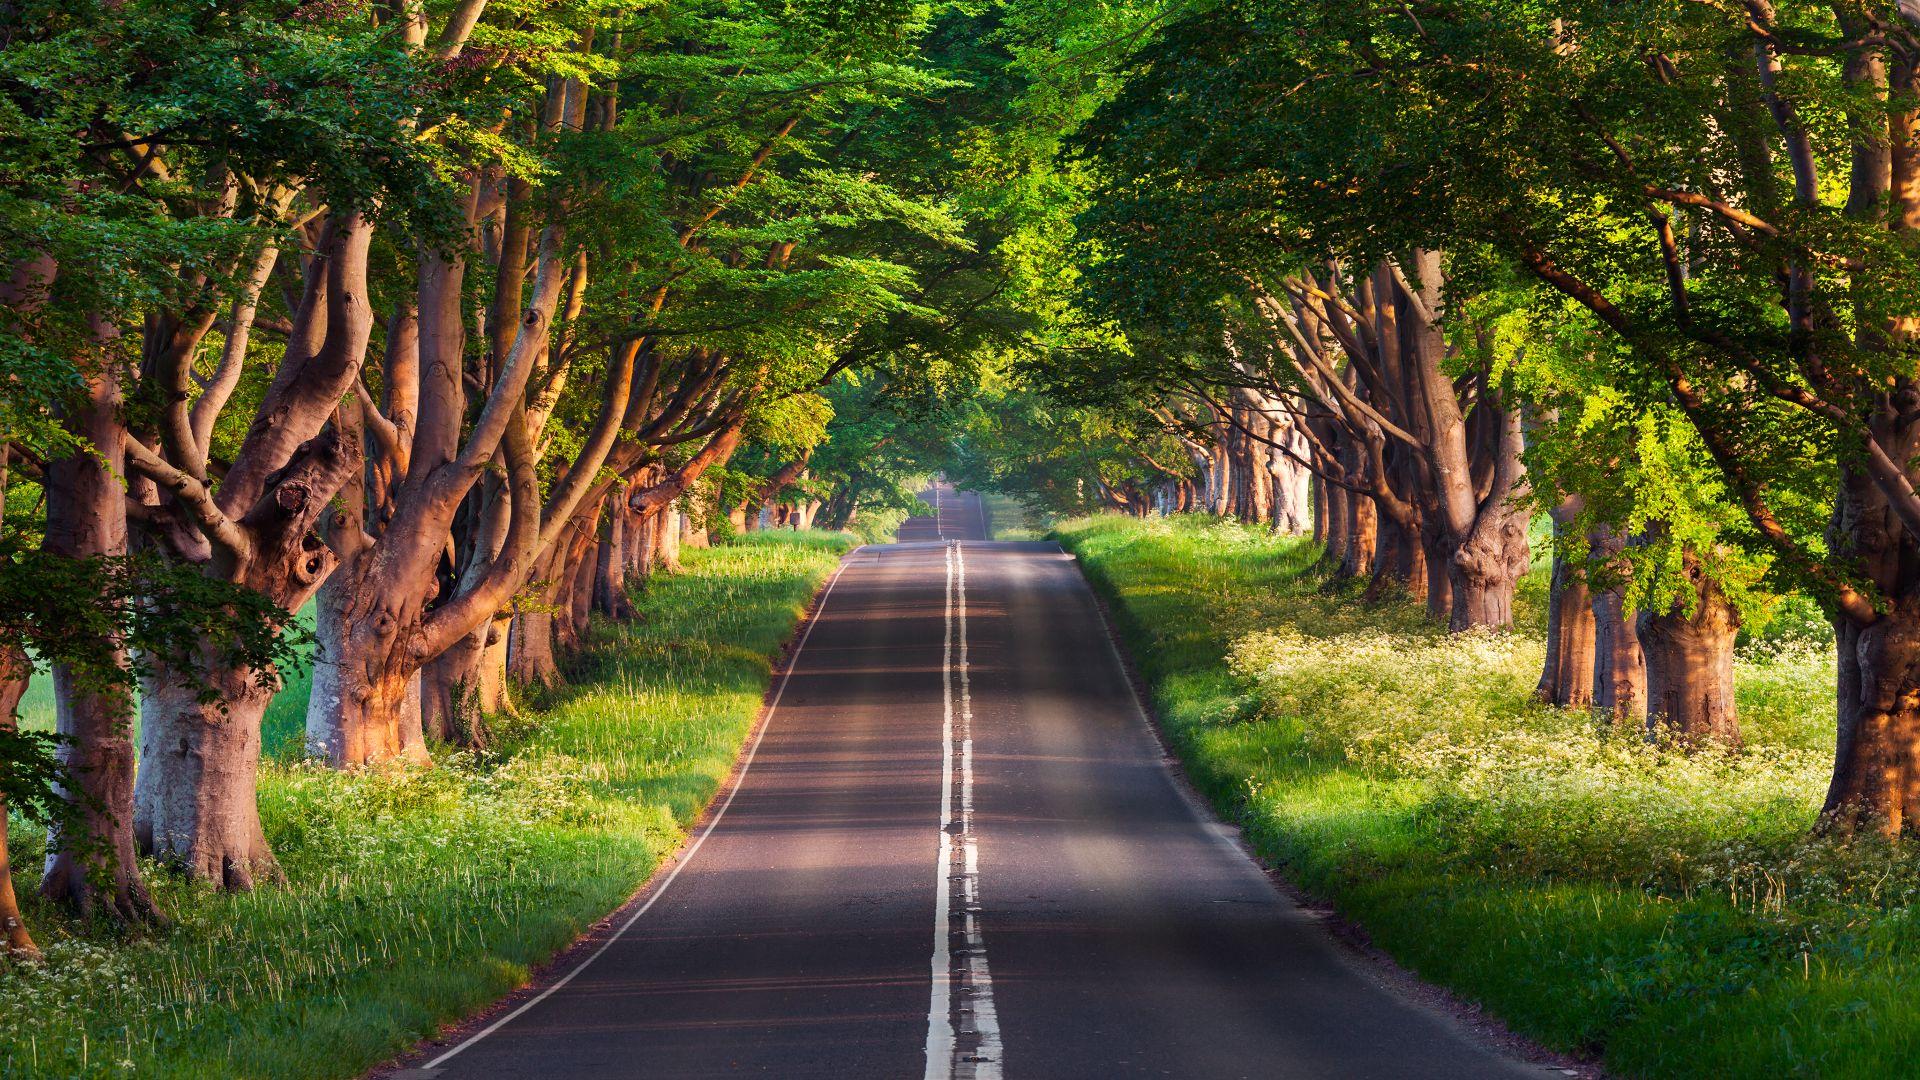 Wallpaper Road Trees Summer 4k Nature 17125